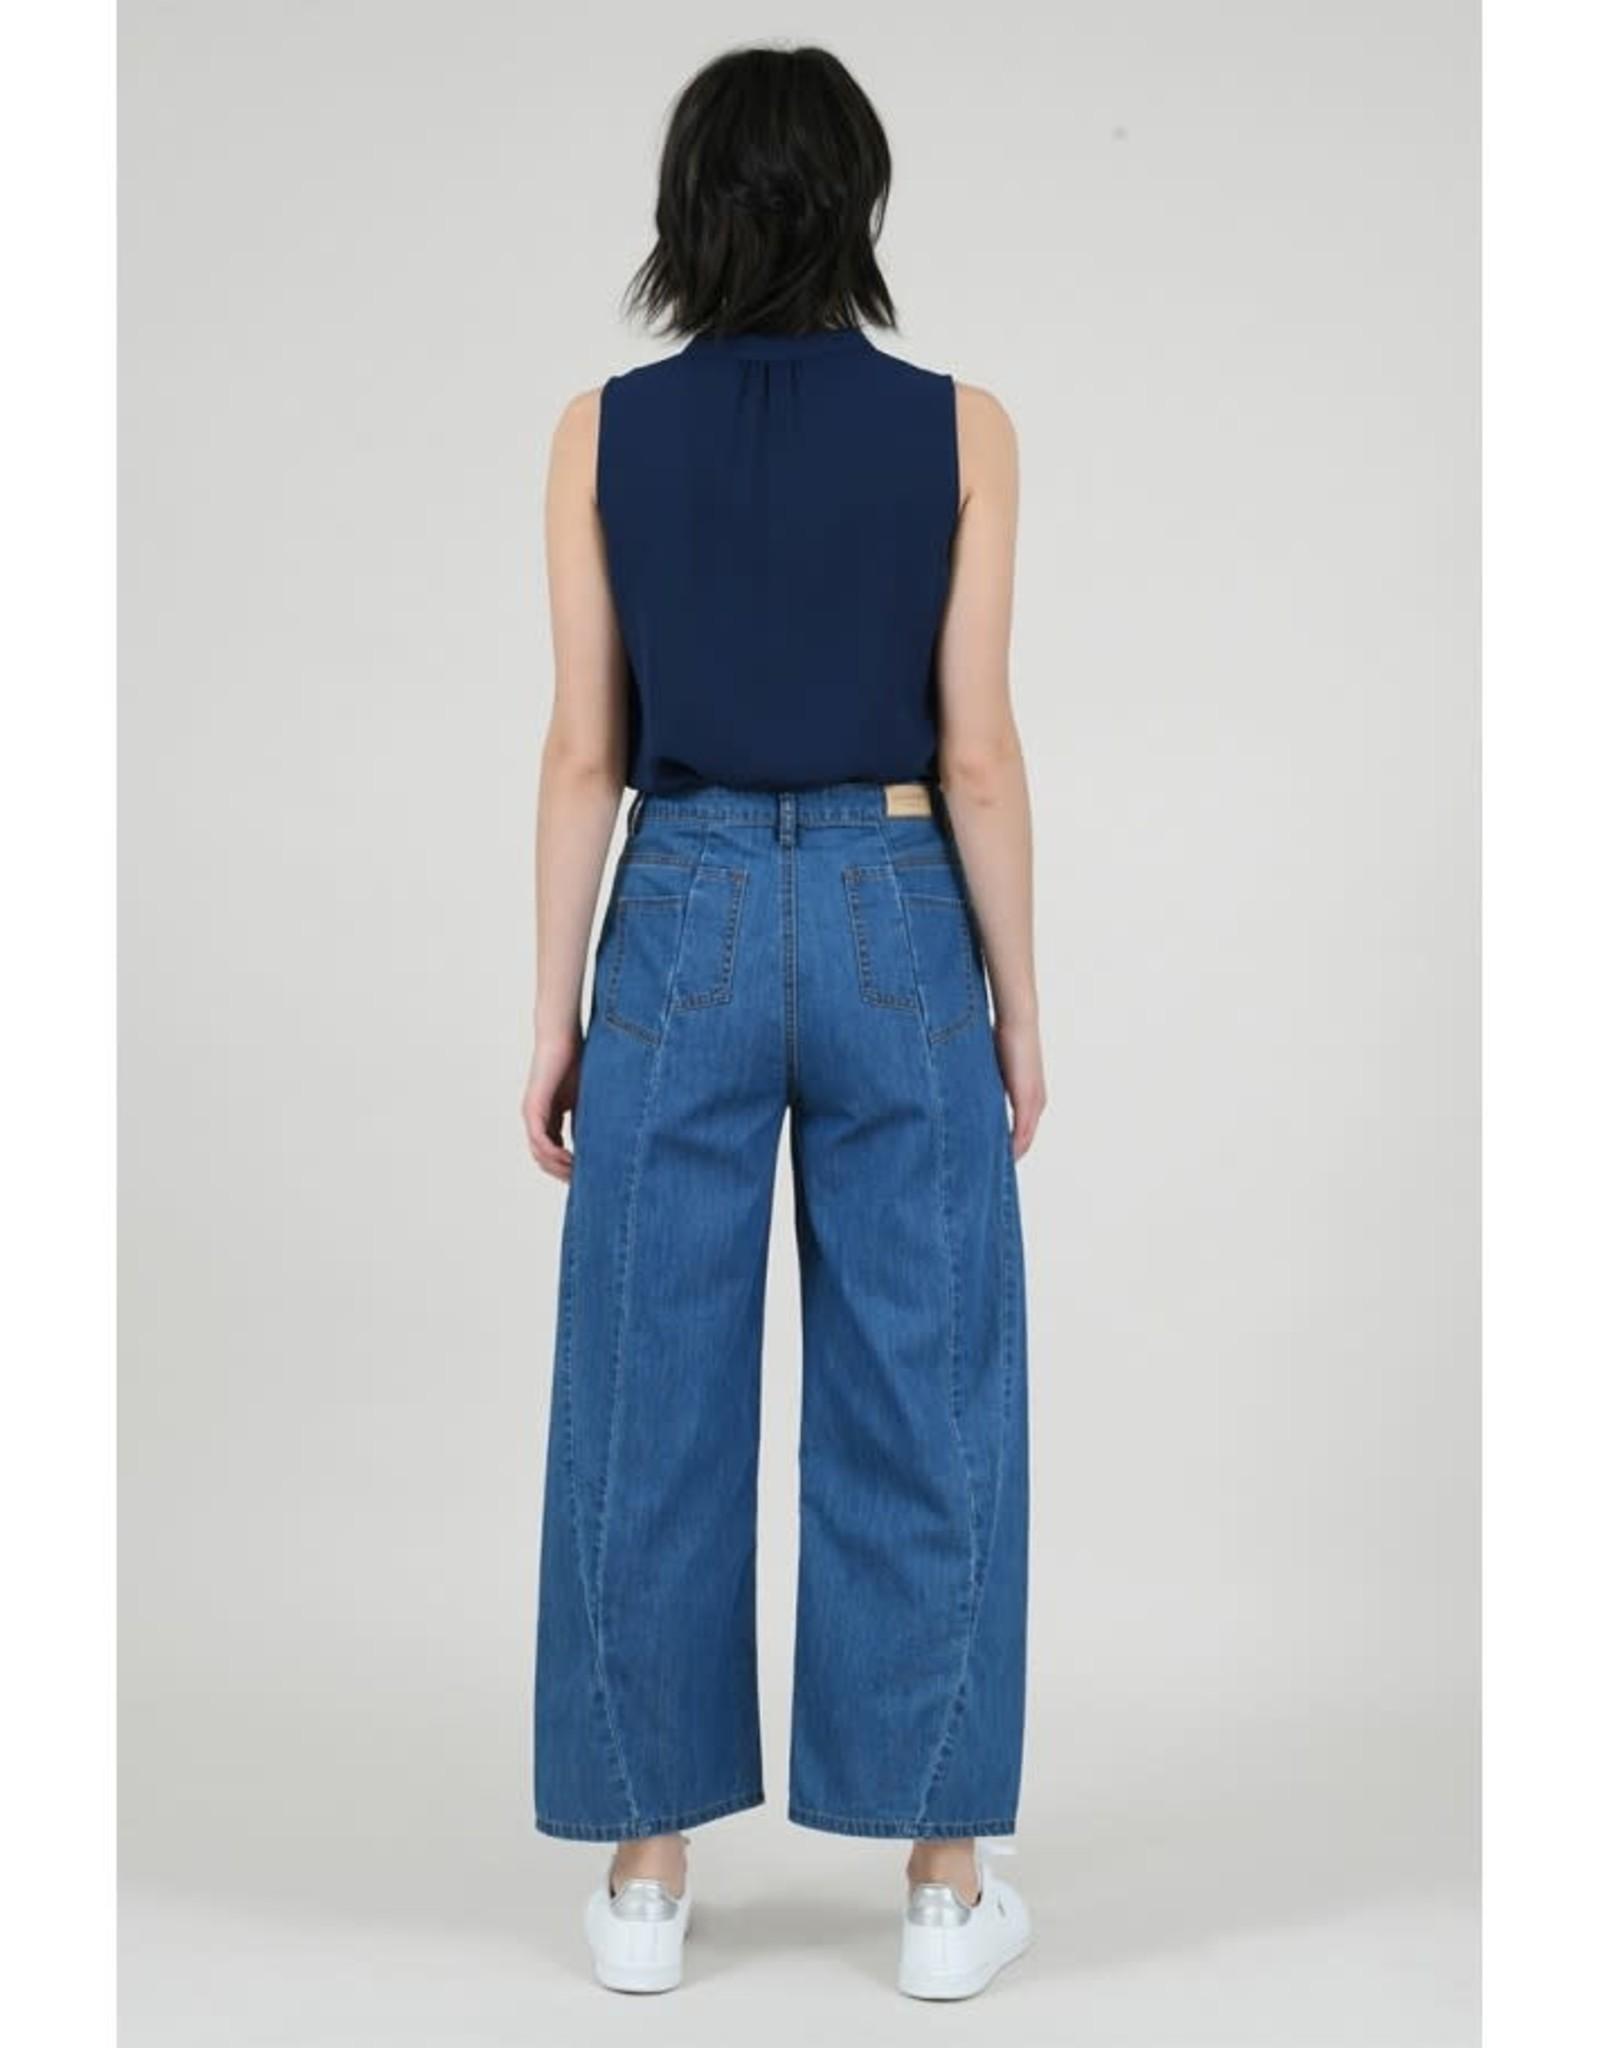 Molly Bracken Woven pants (brut denim)